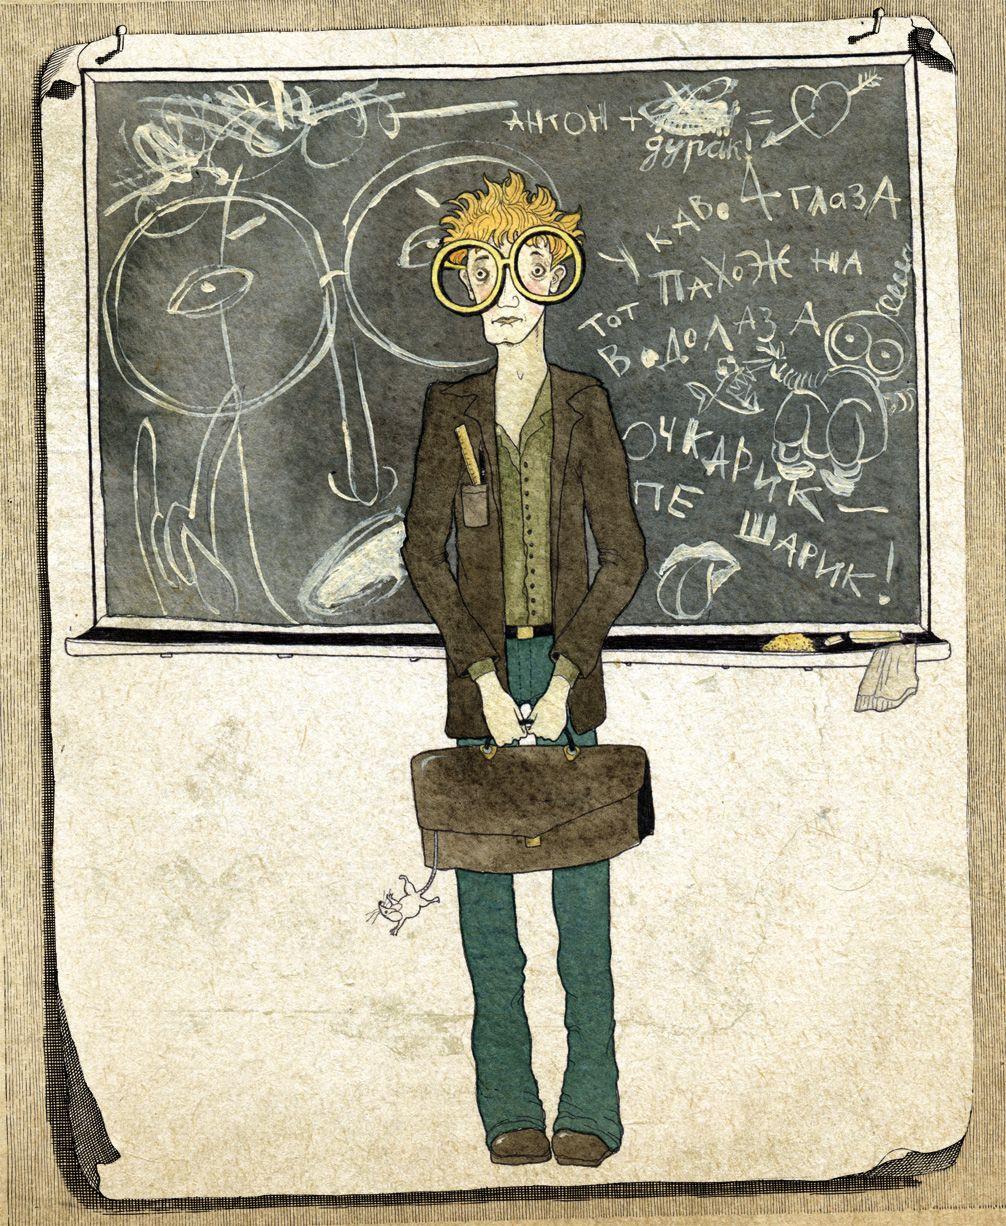 Illustrator Sveta Dorosheva Represented by http://auraphoto.tumblr.com www.auraphotoagency.com